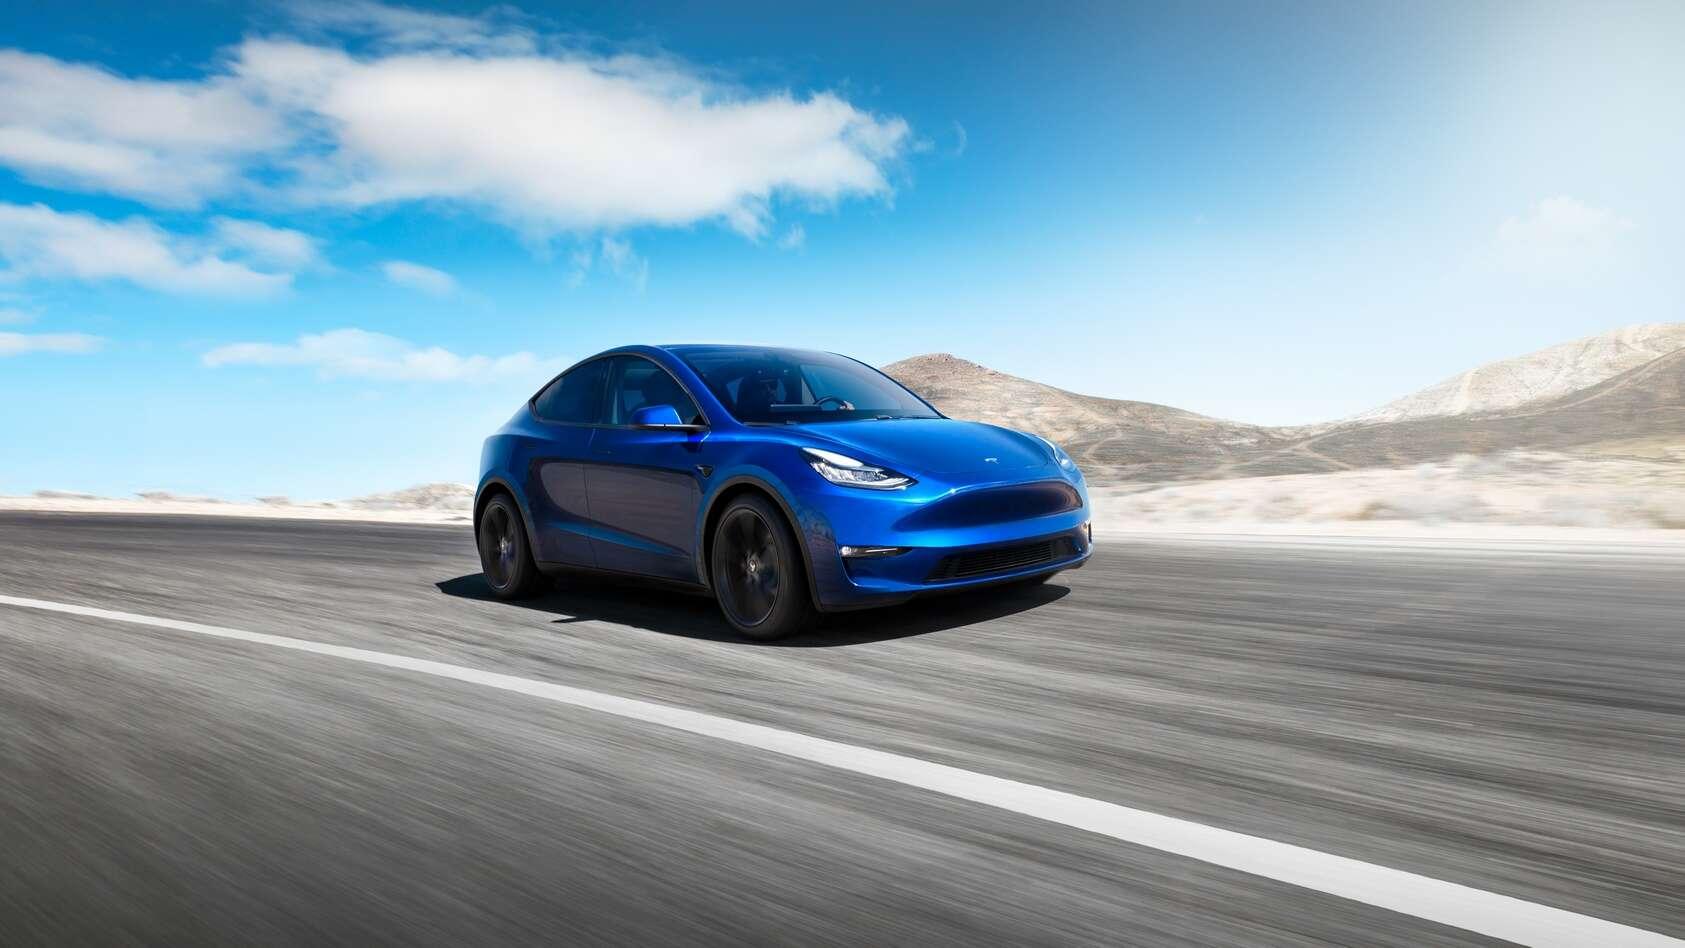 Le Tesla Model Y. © Tesla